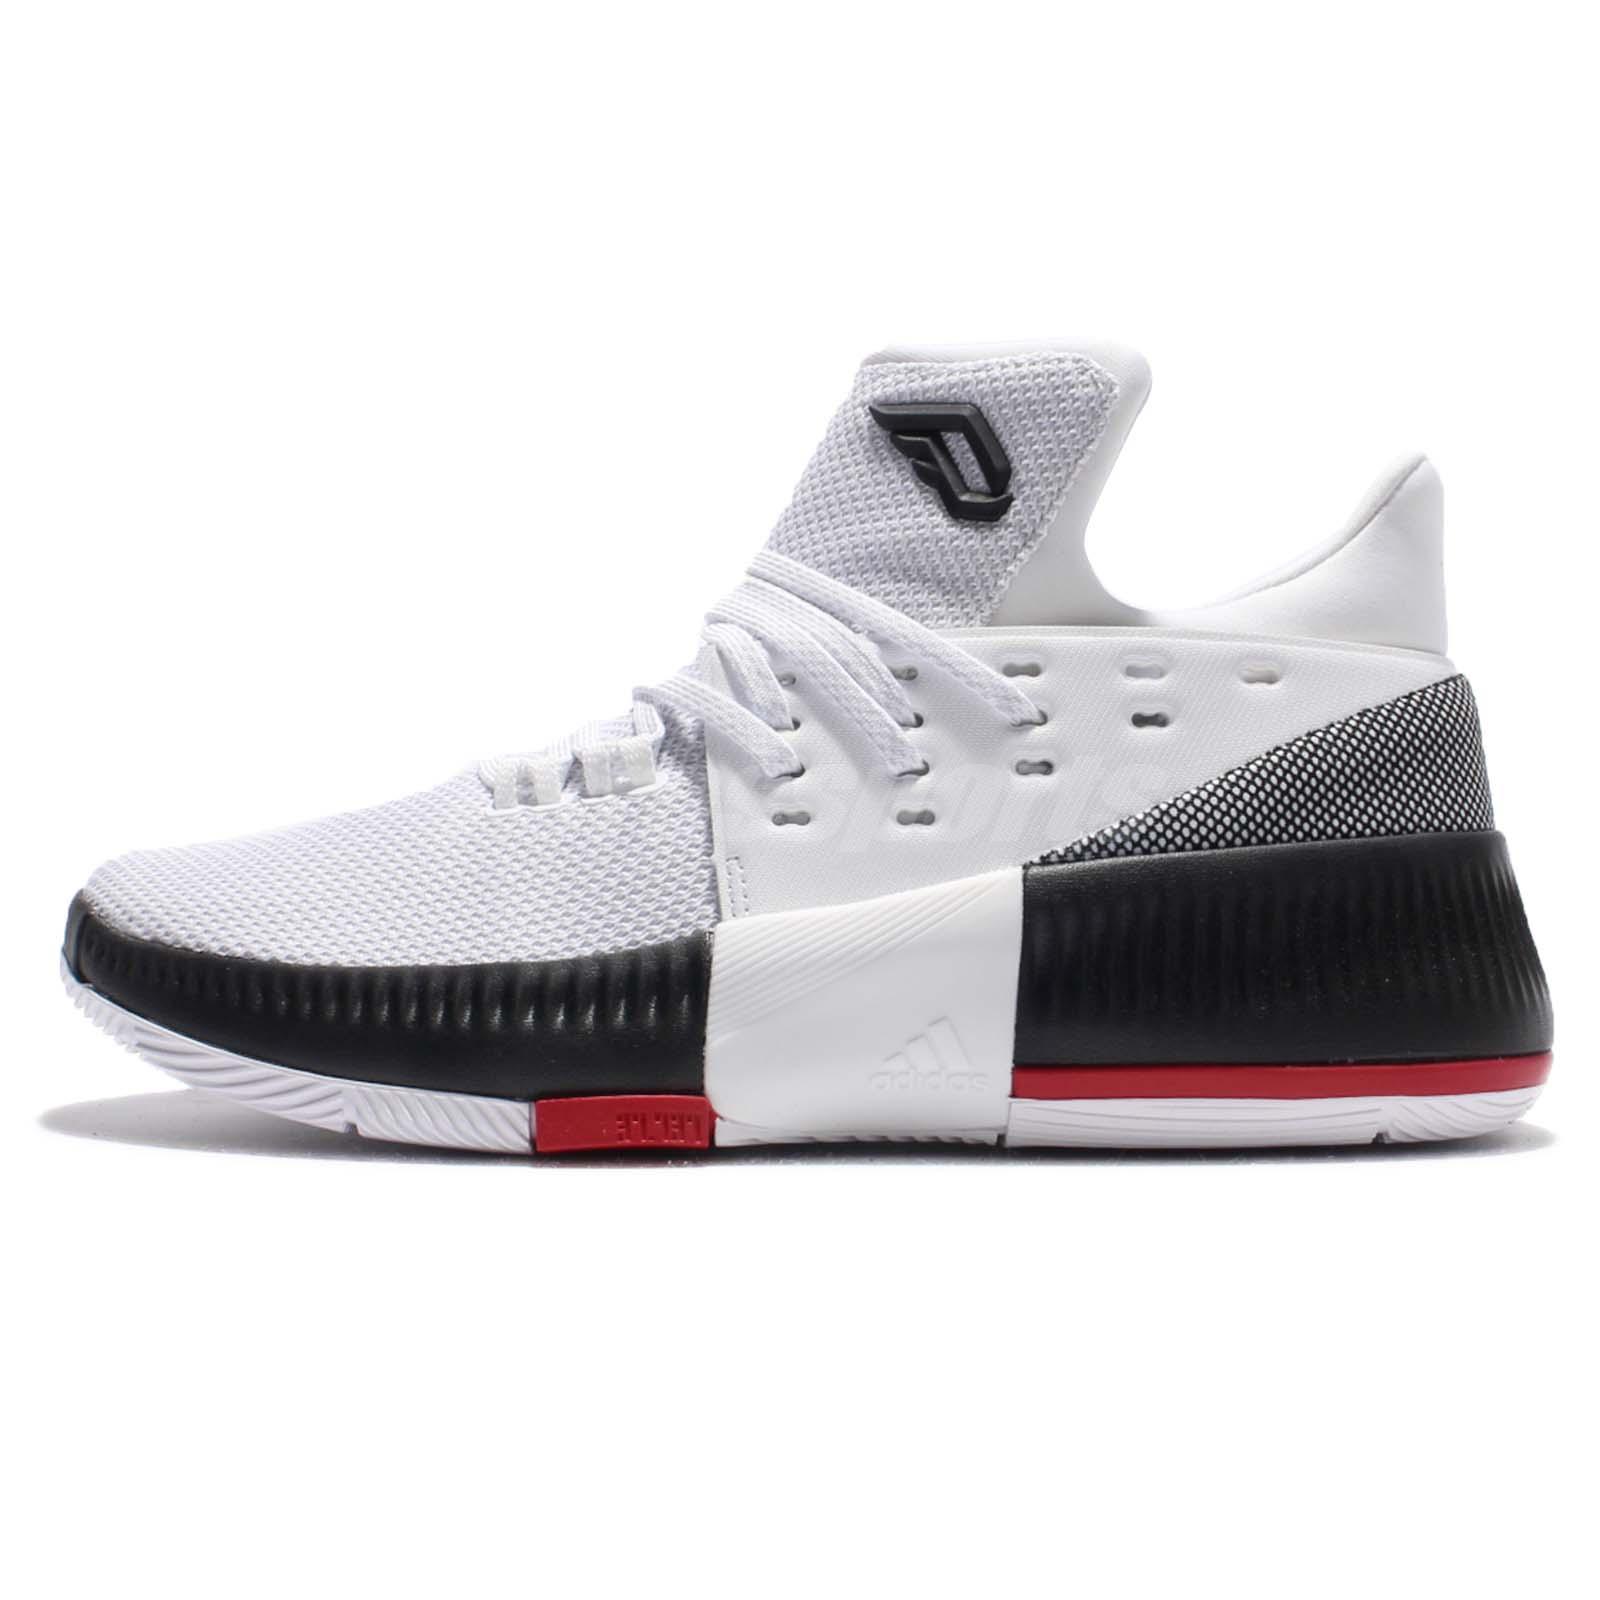 adidas D Lillard 3 J Damian Rip City White Kids Junior Basketball Shoes  BW0535